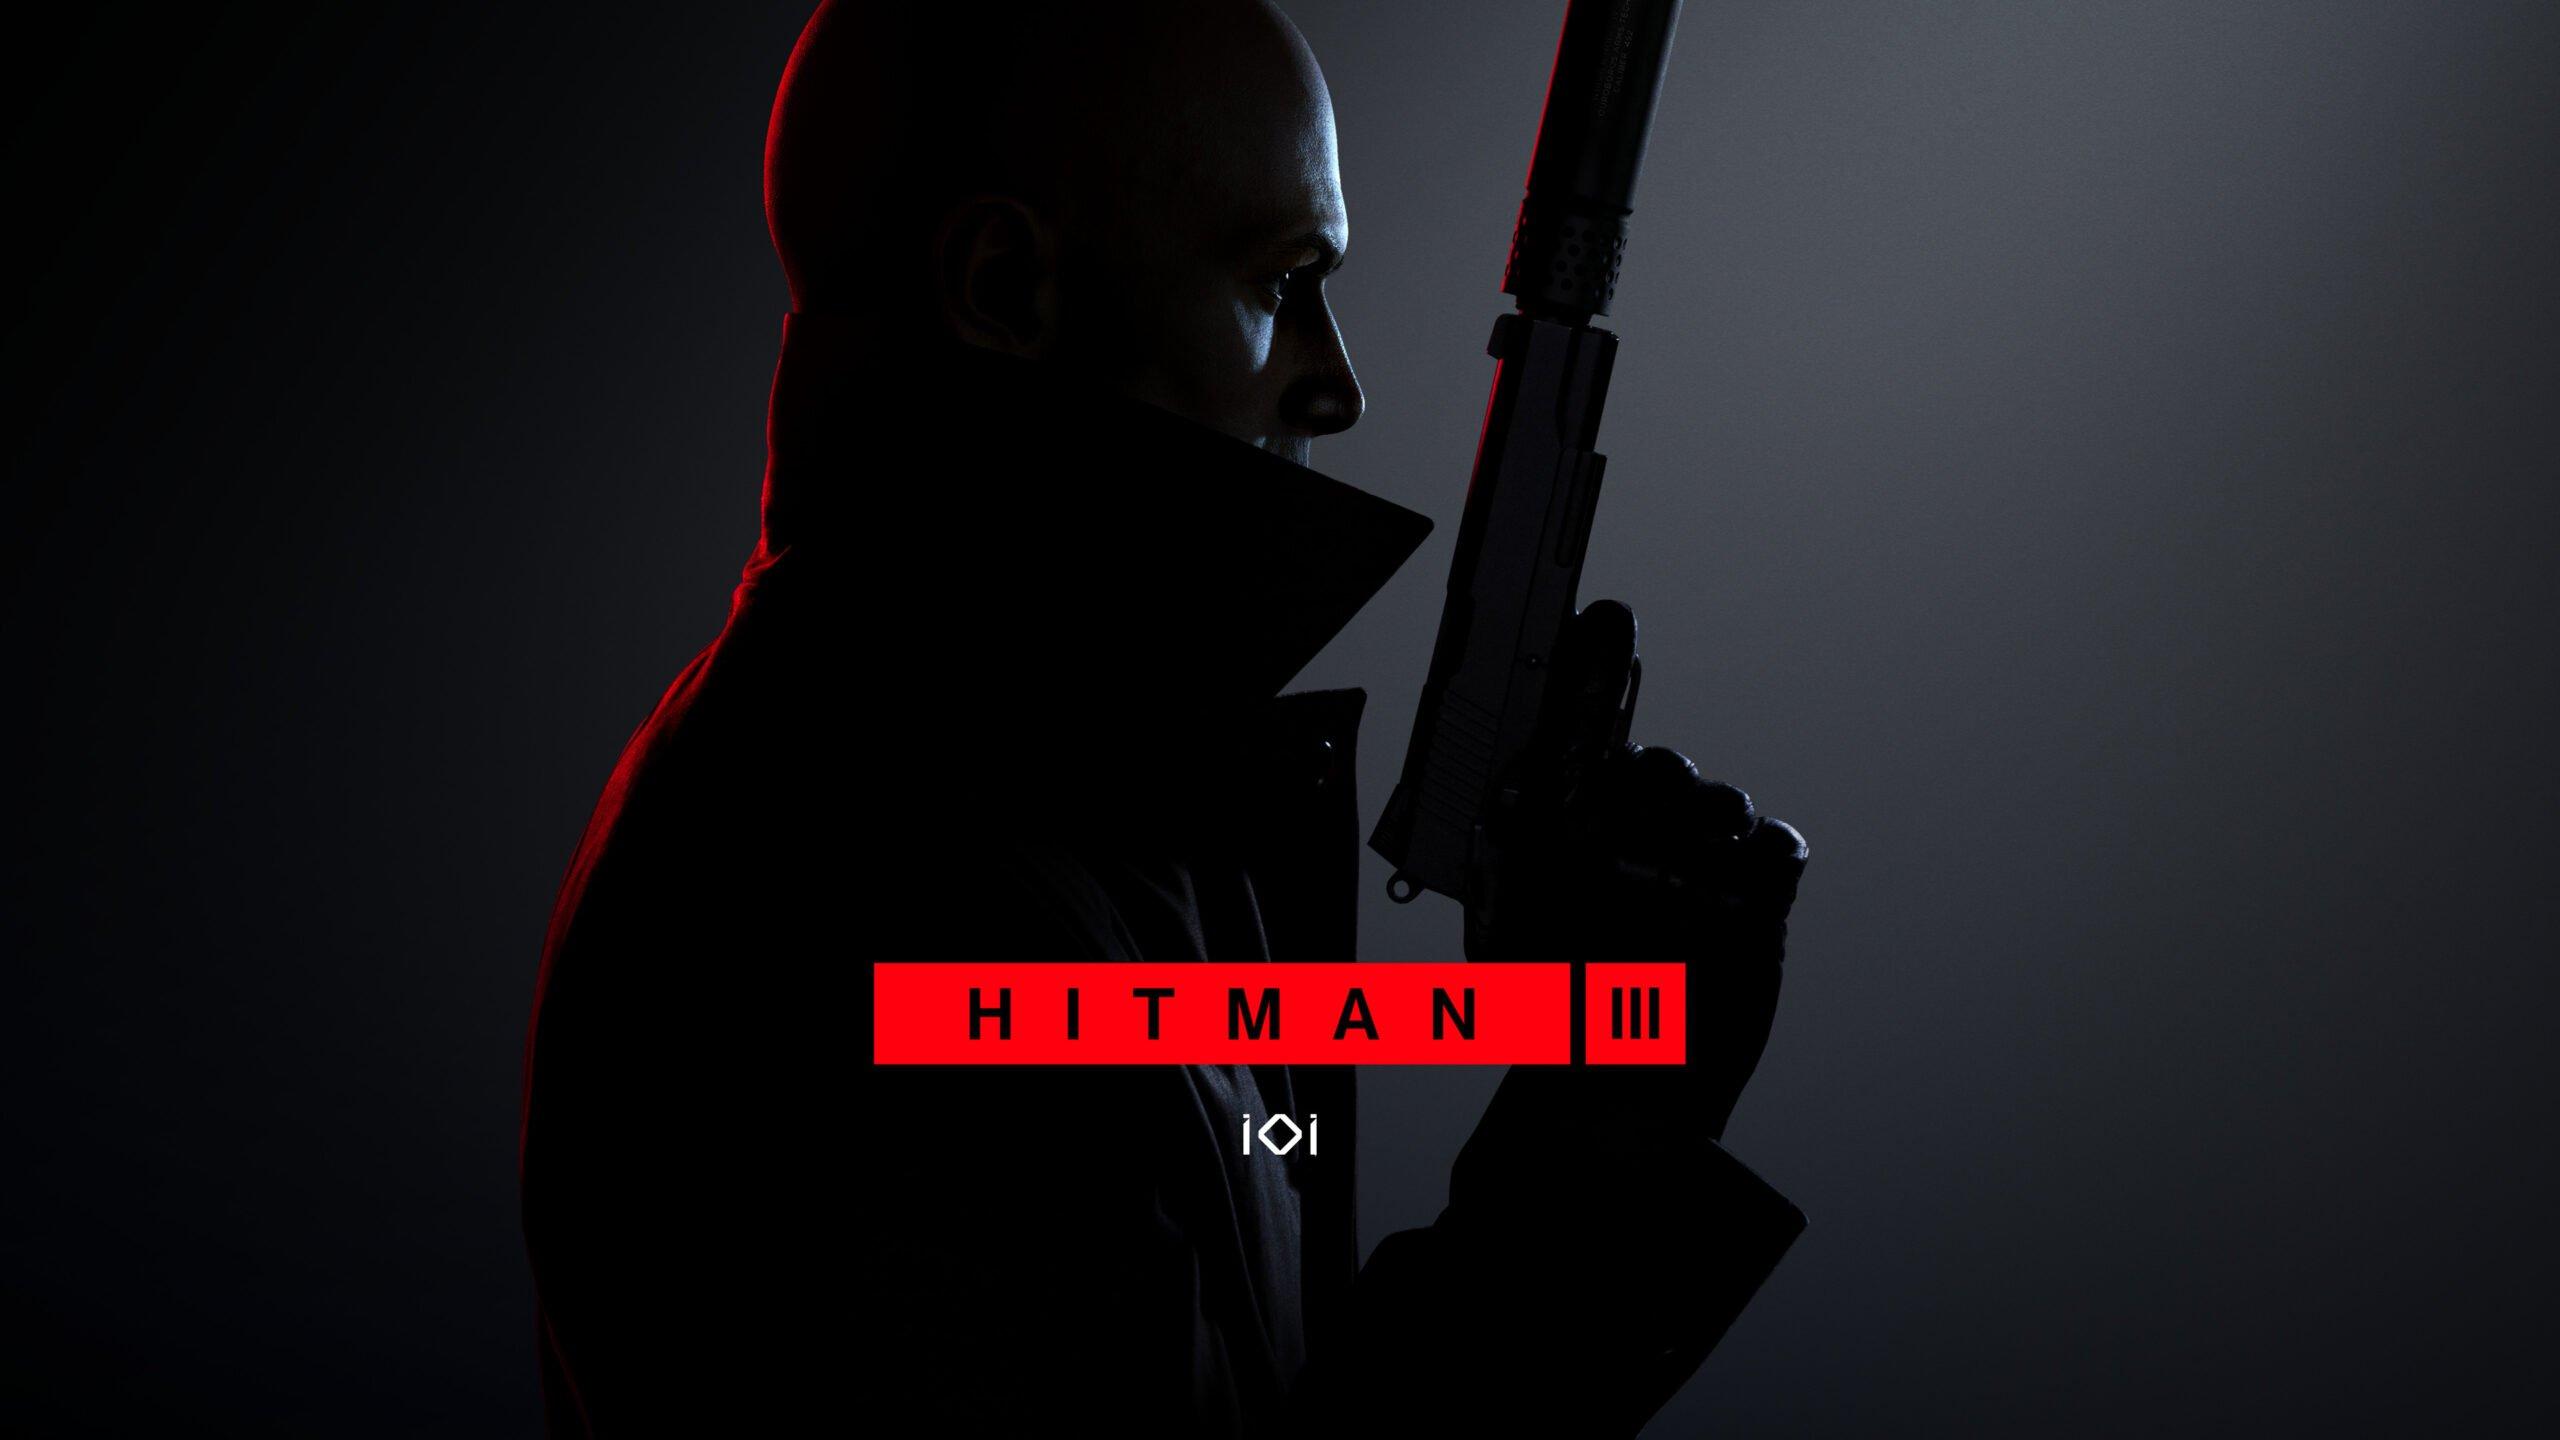 Hitman 3 Video game review